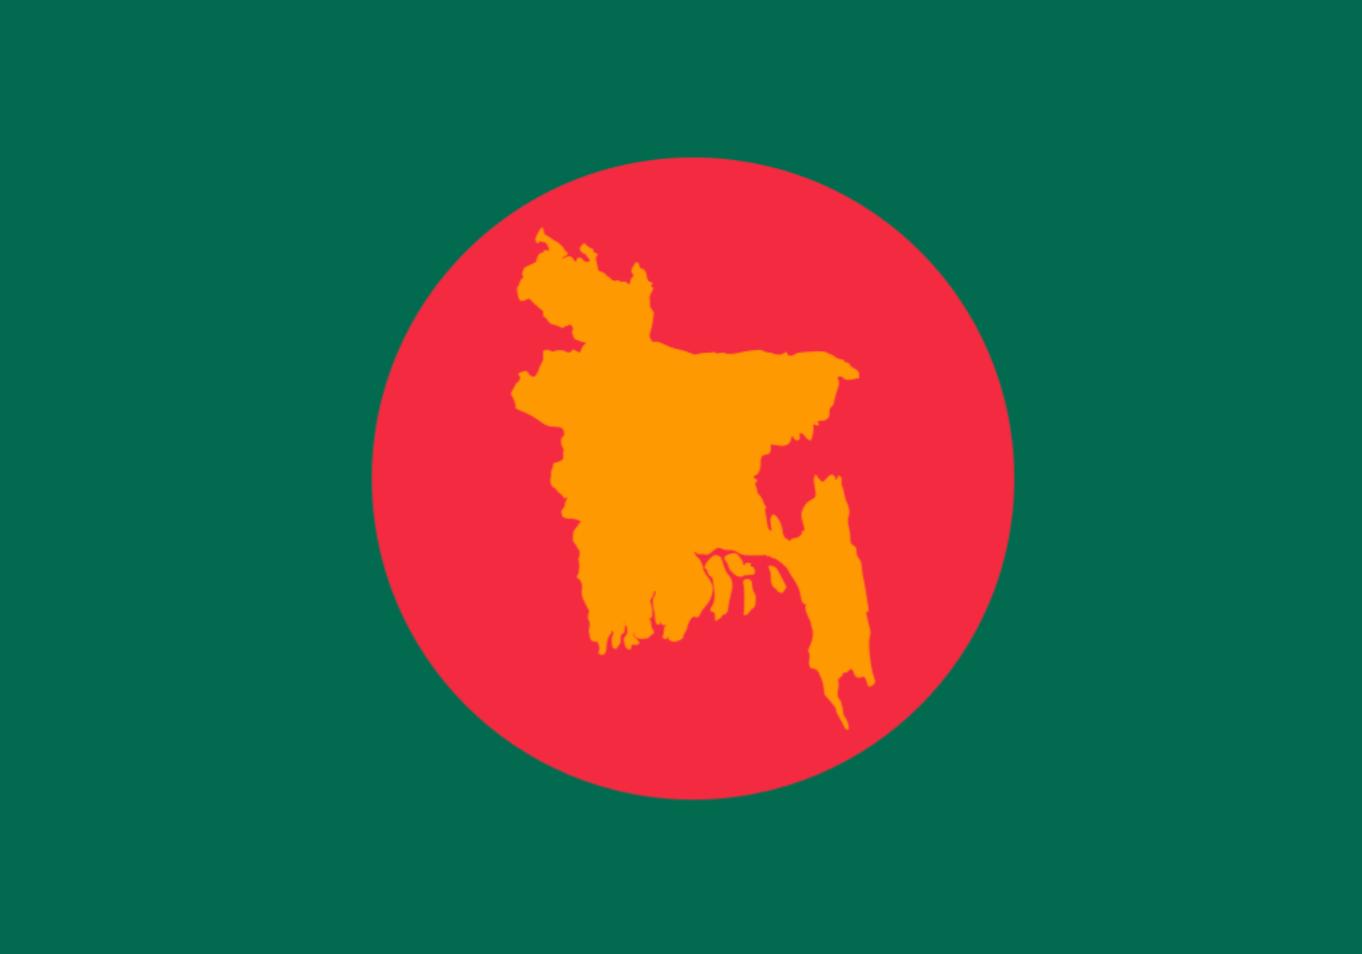 Bangladesh Independence Day Jamaica 311